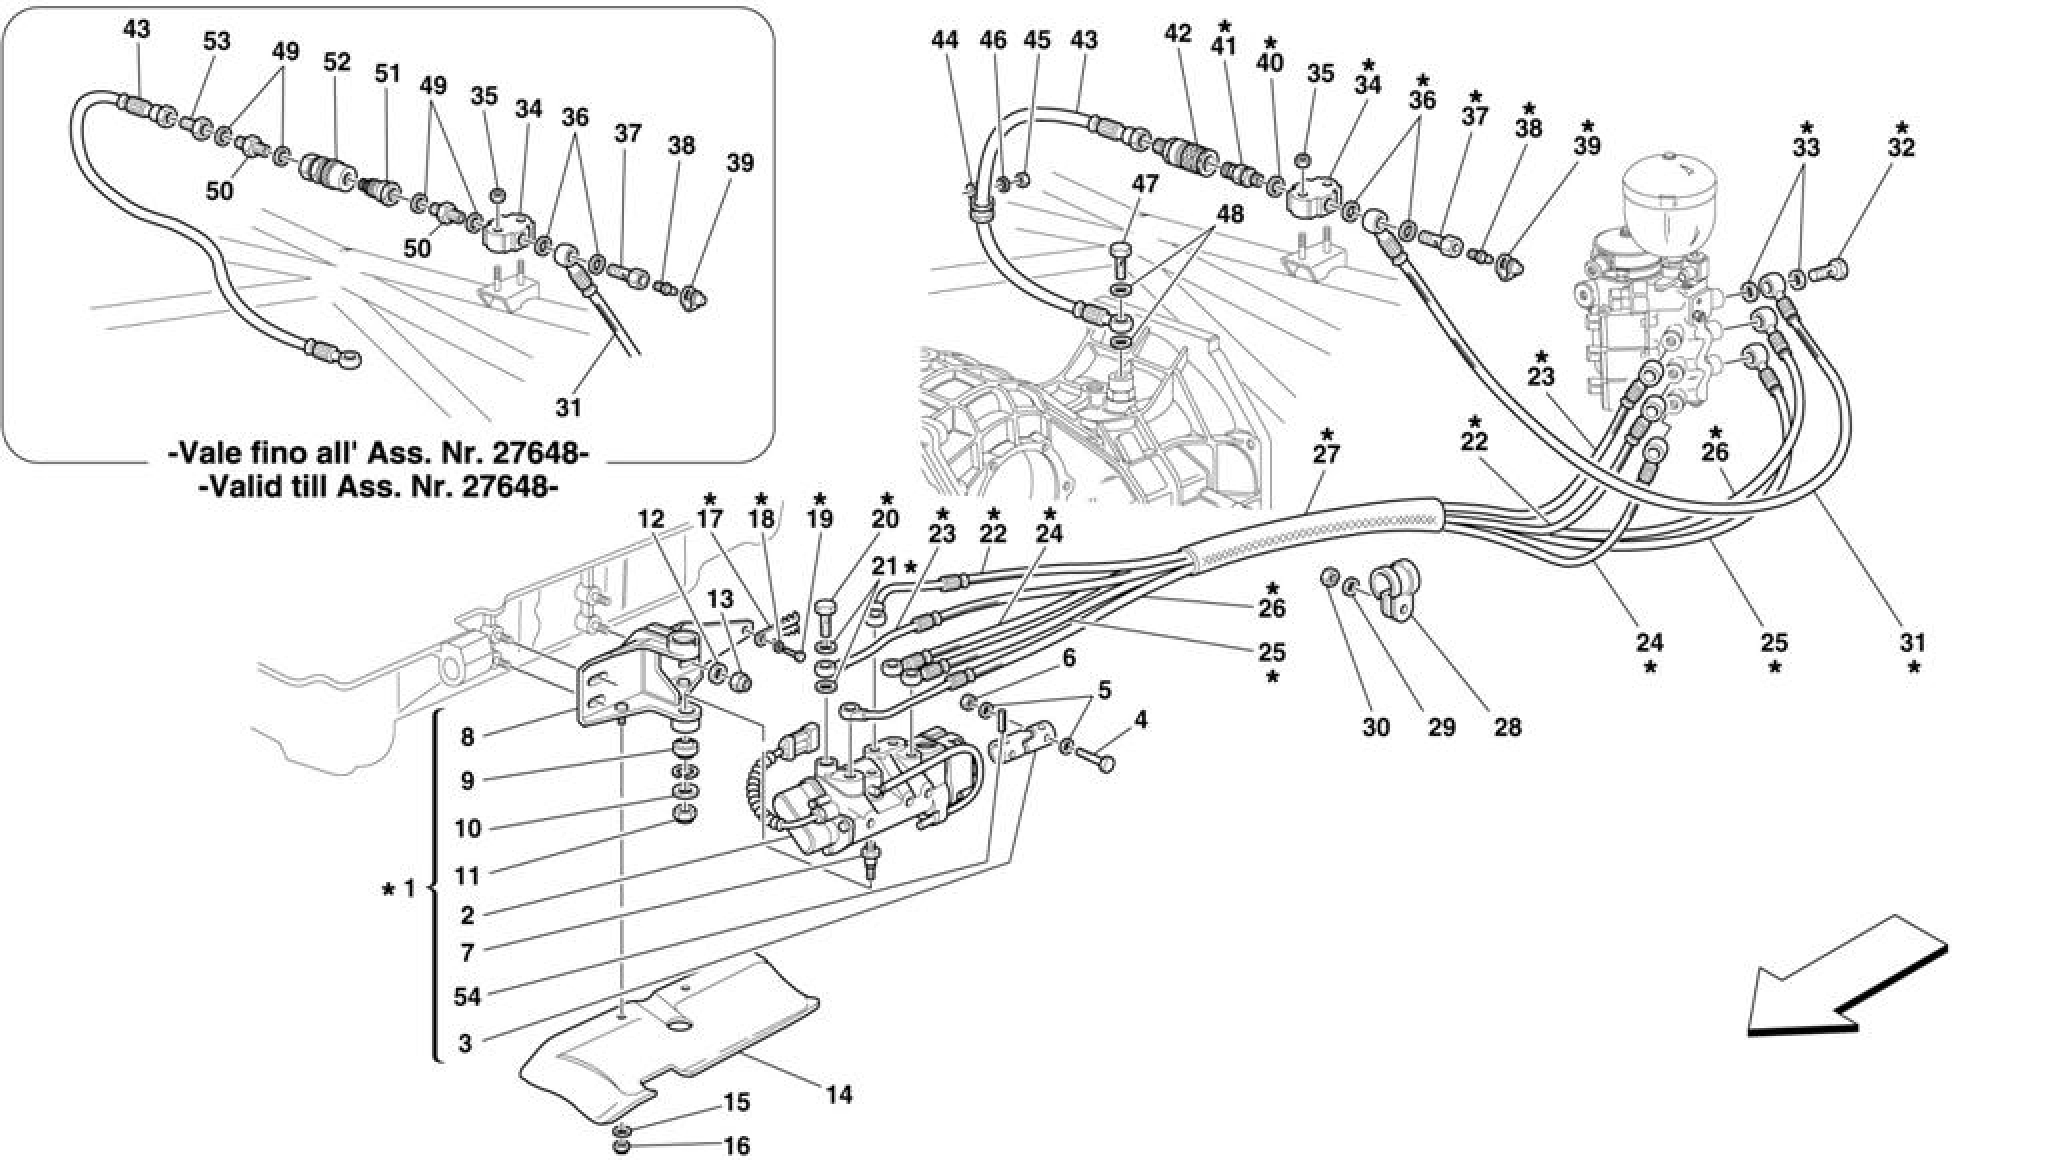 Ferrari F355 M5.2 (1996+) F1 CLUTCH HYDRAULIC CONTROL